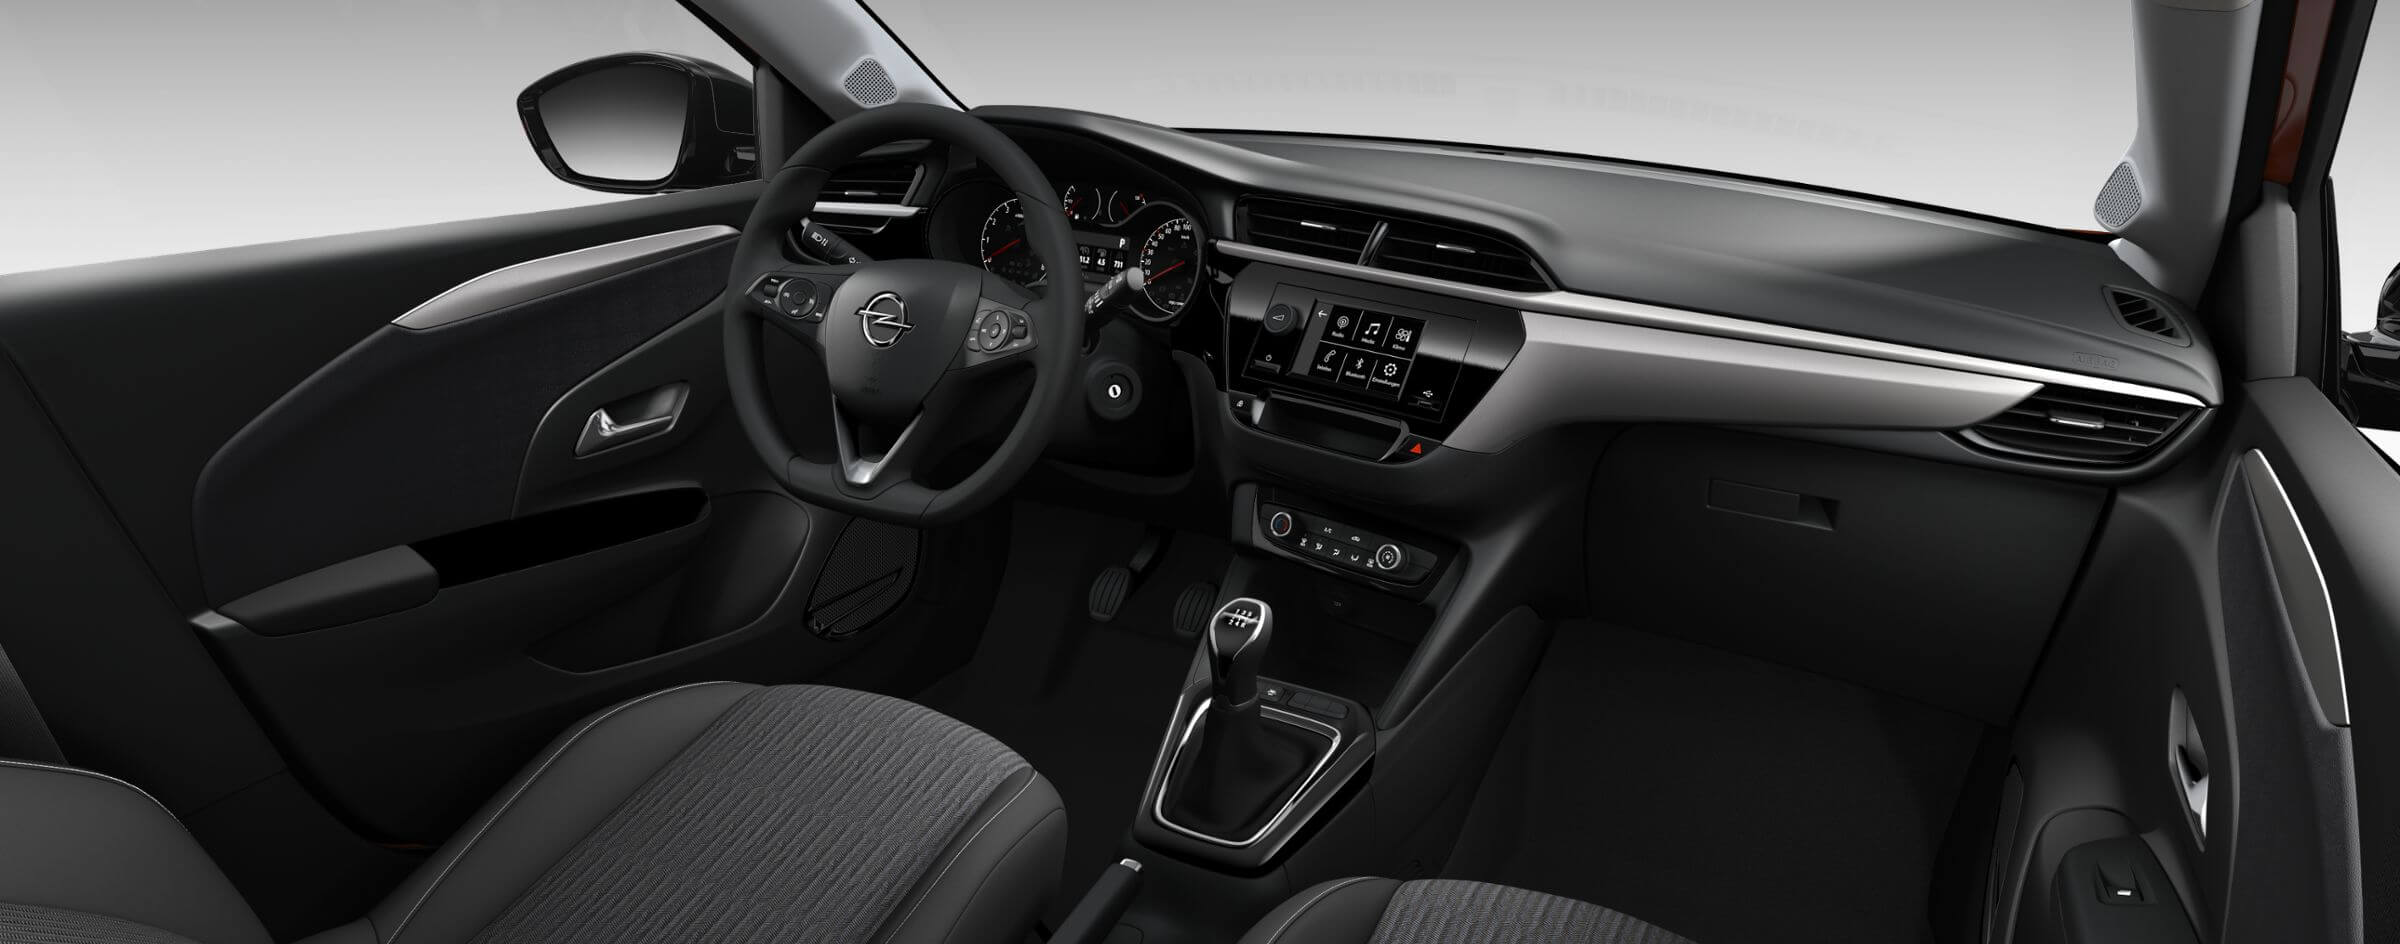 Opel Corsa Edition: interior.